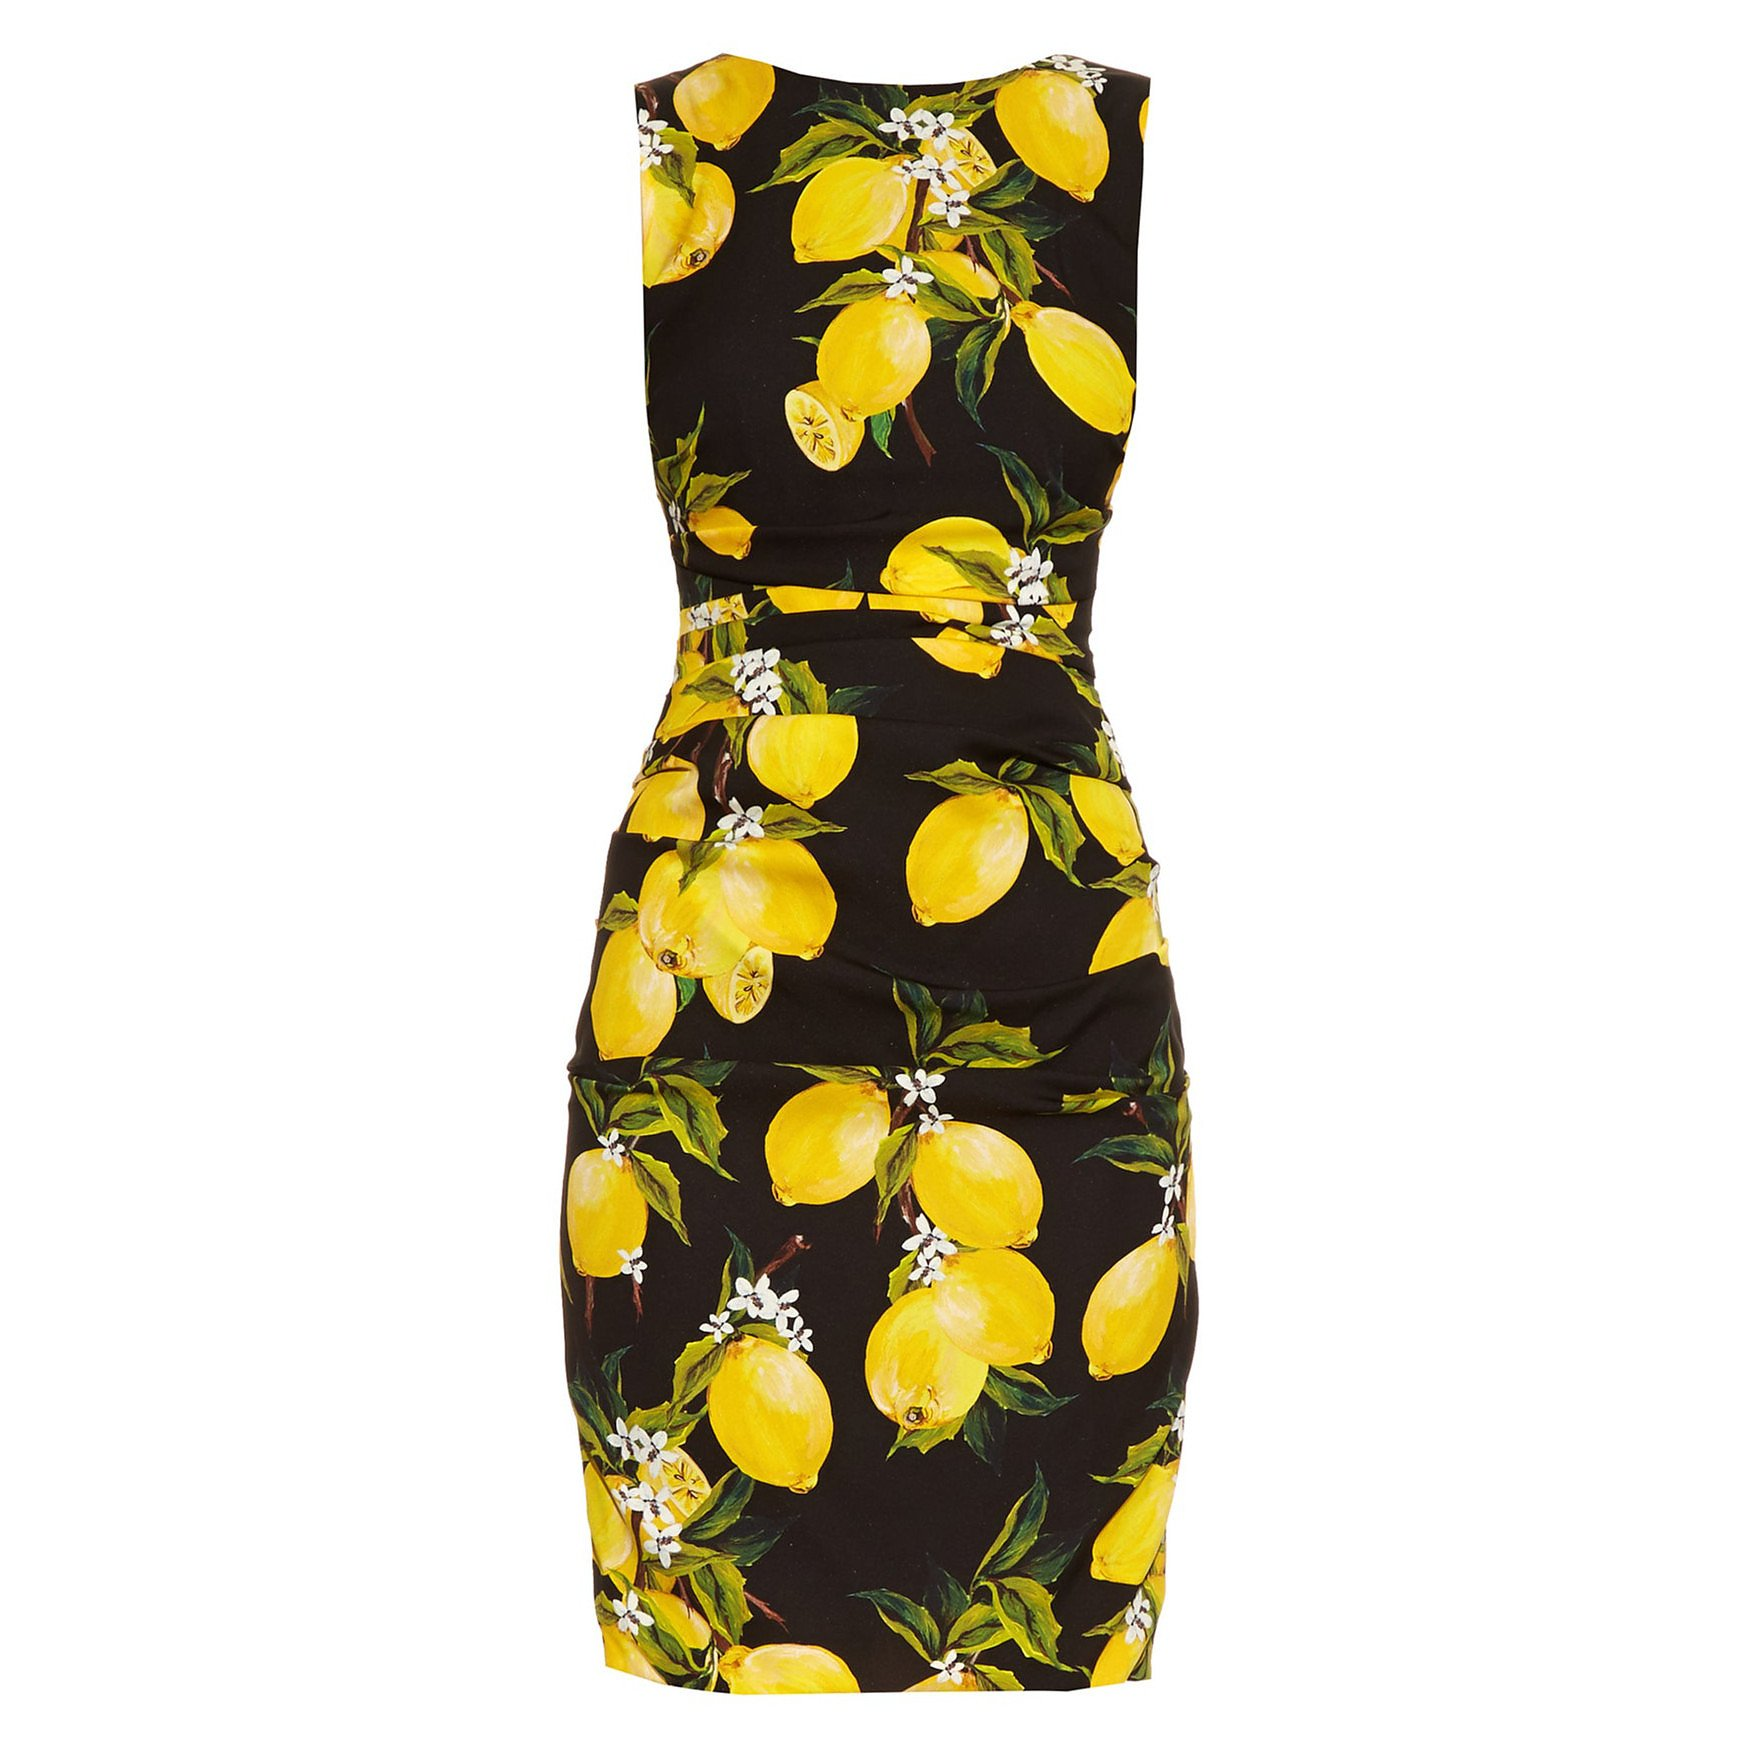 DOLCE & GABBANA Lemon-Print Ruched Silk Dress